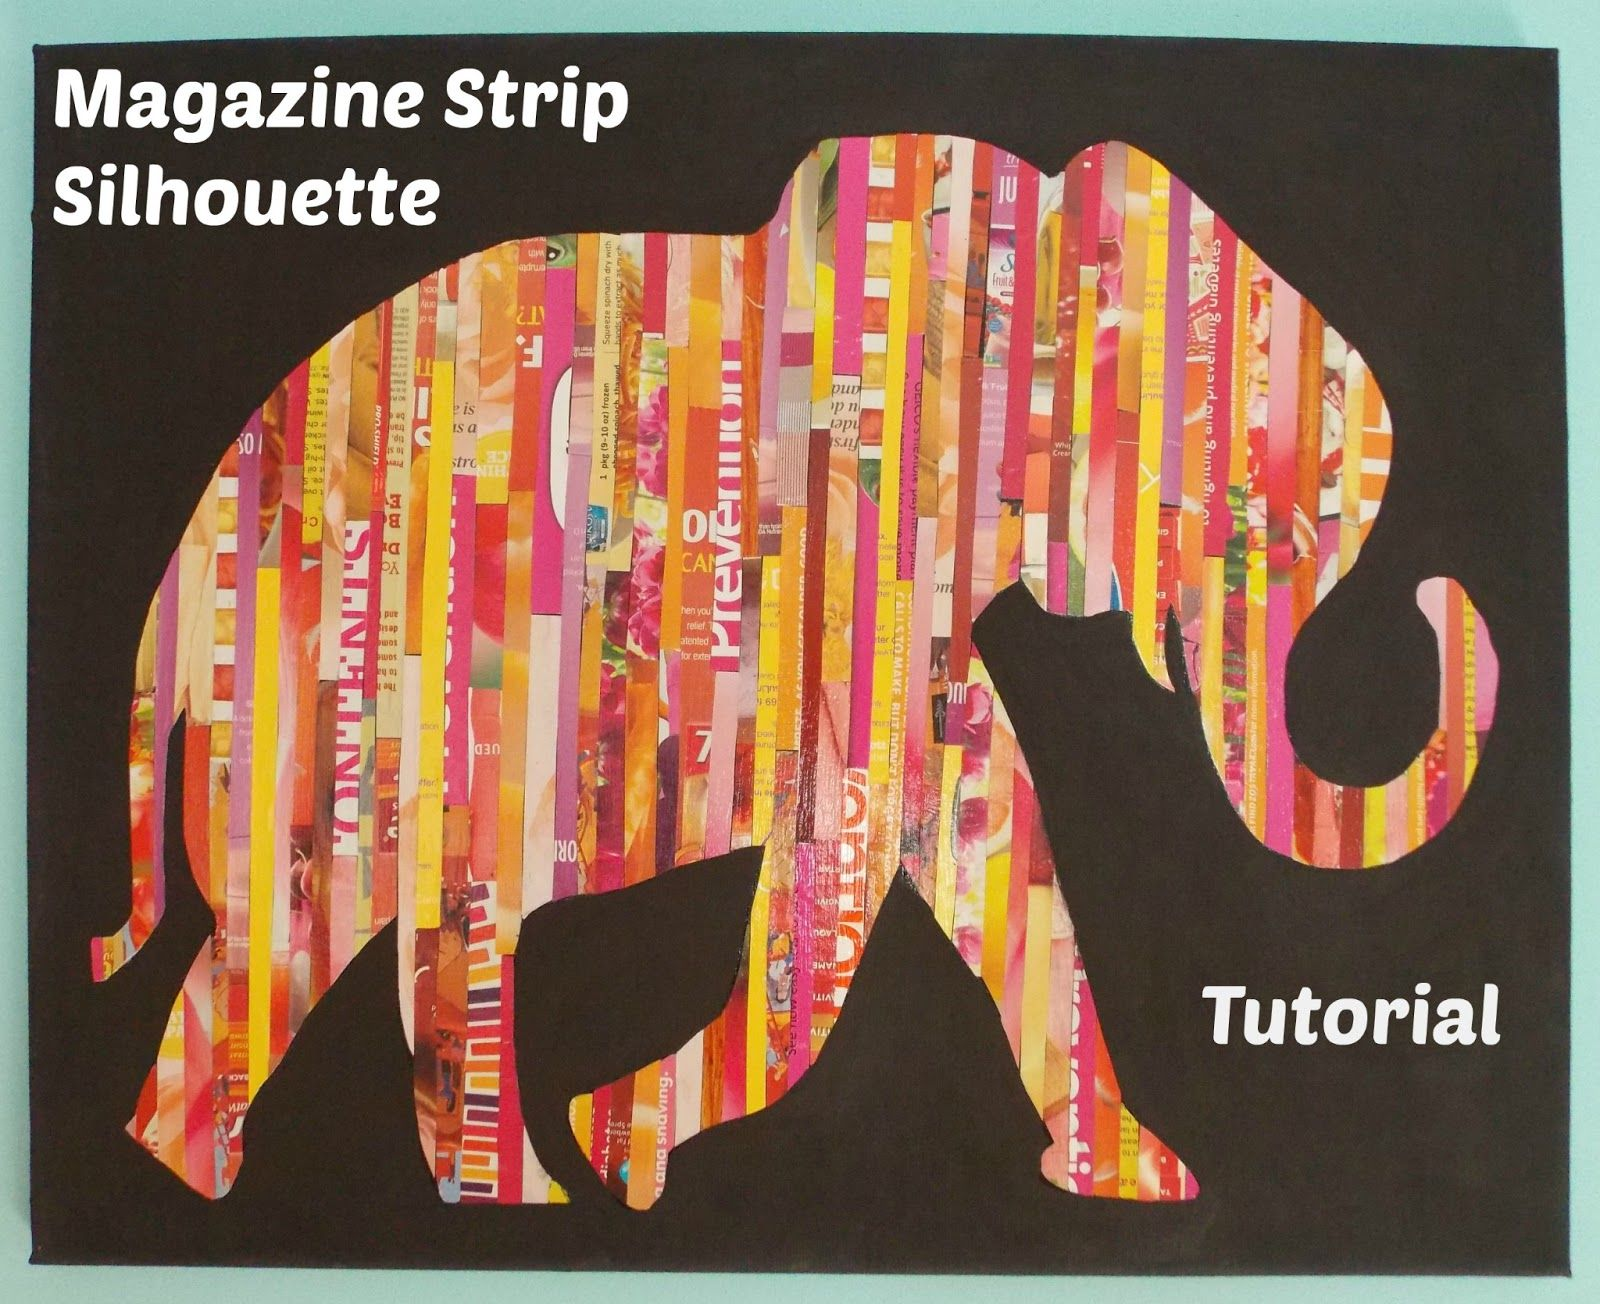 magazine strip picture  art  Pinterest  아이디어 및 동물